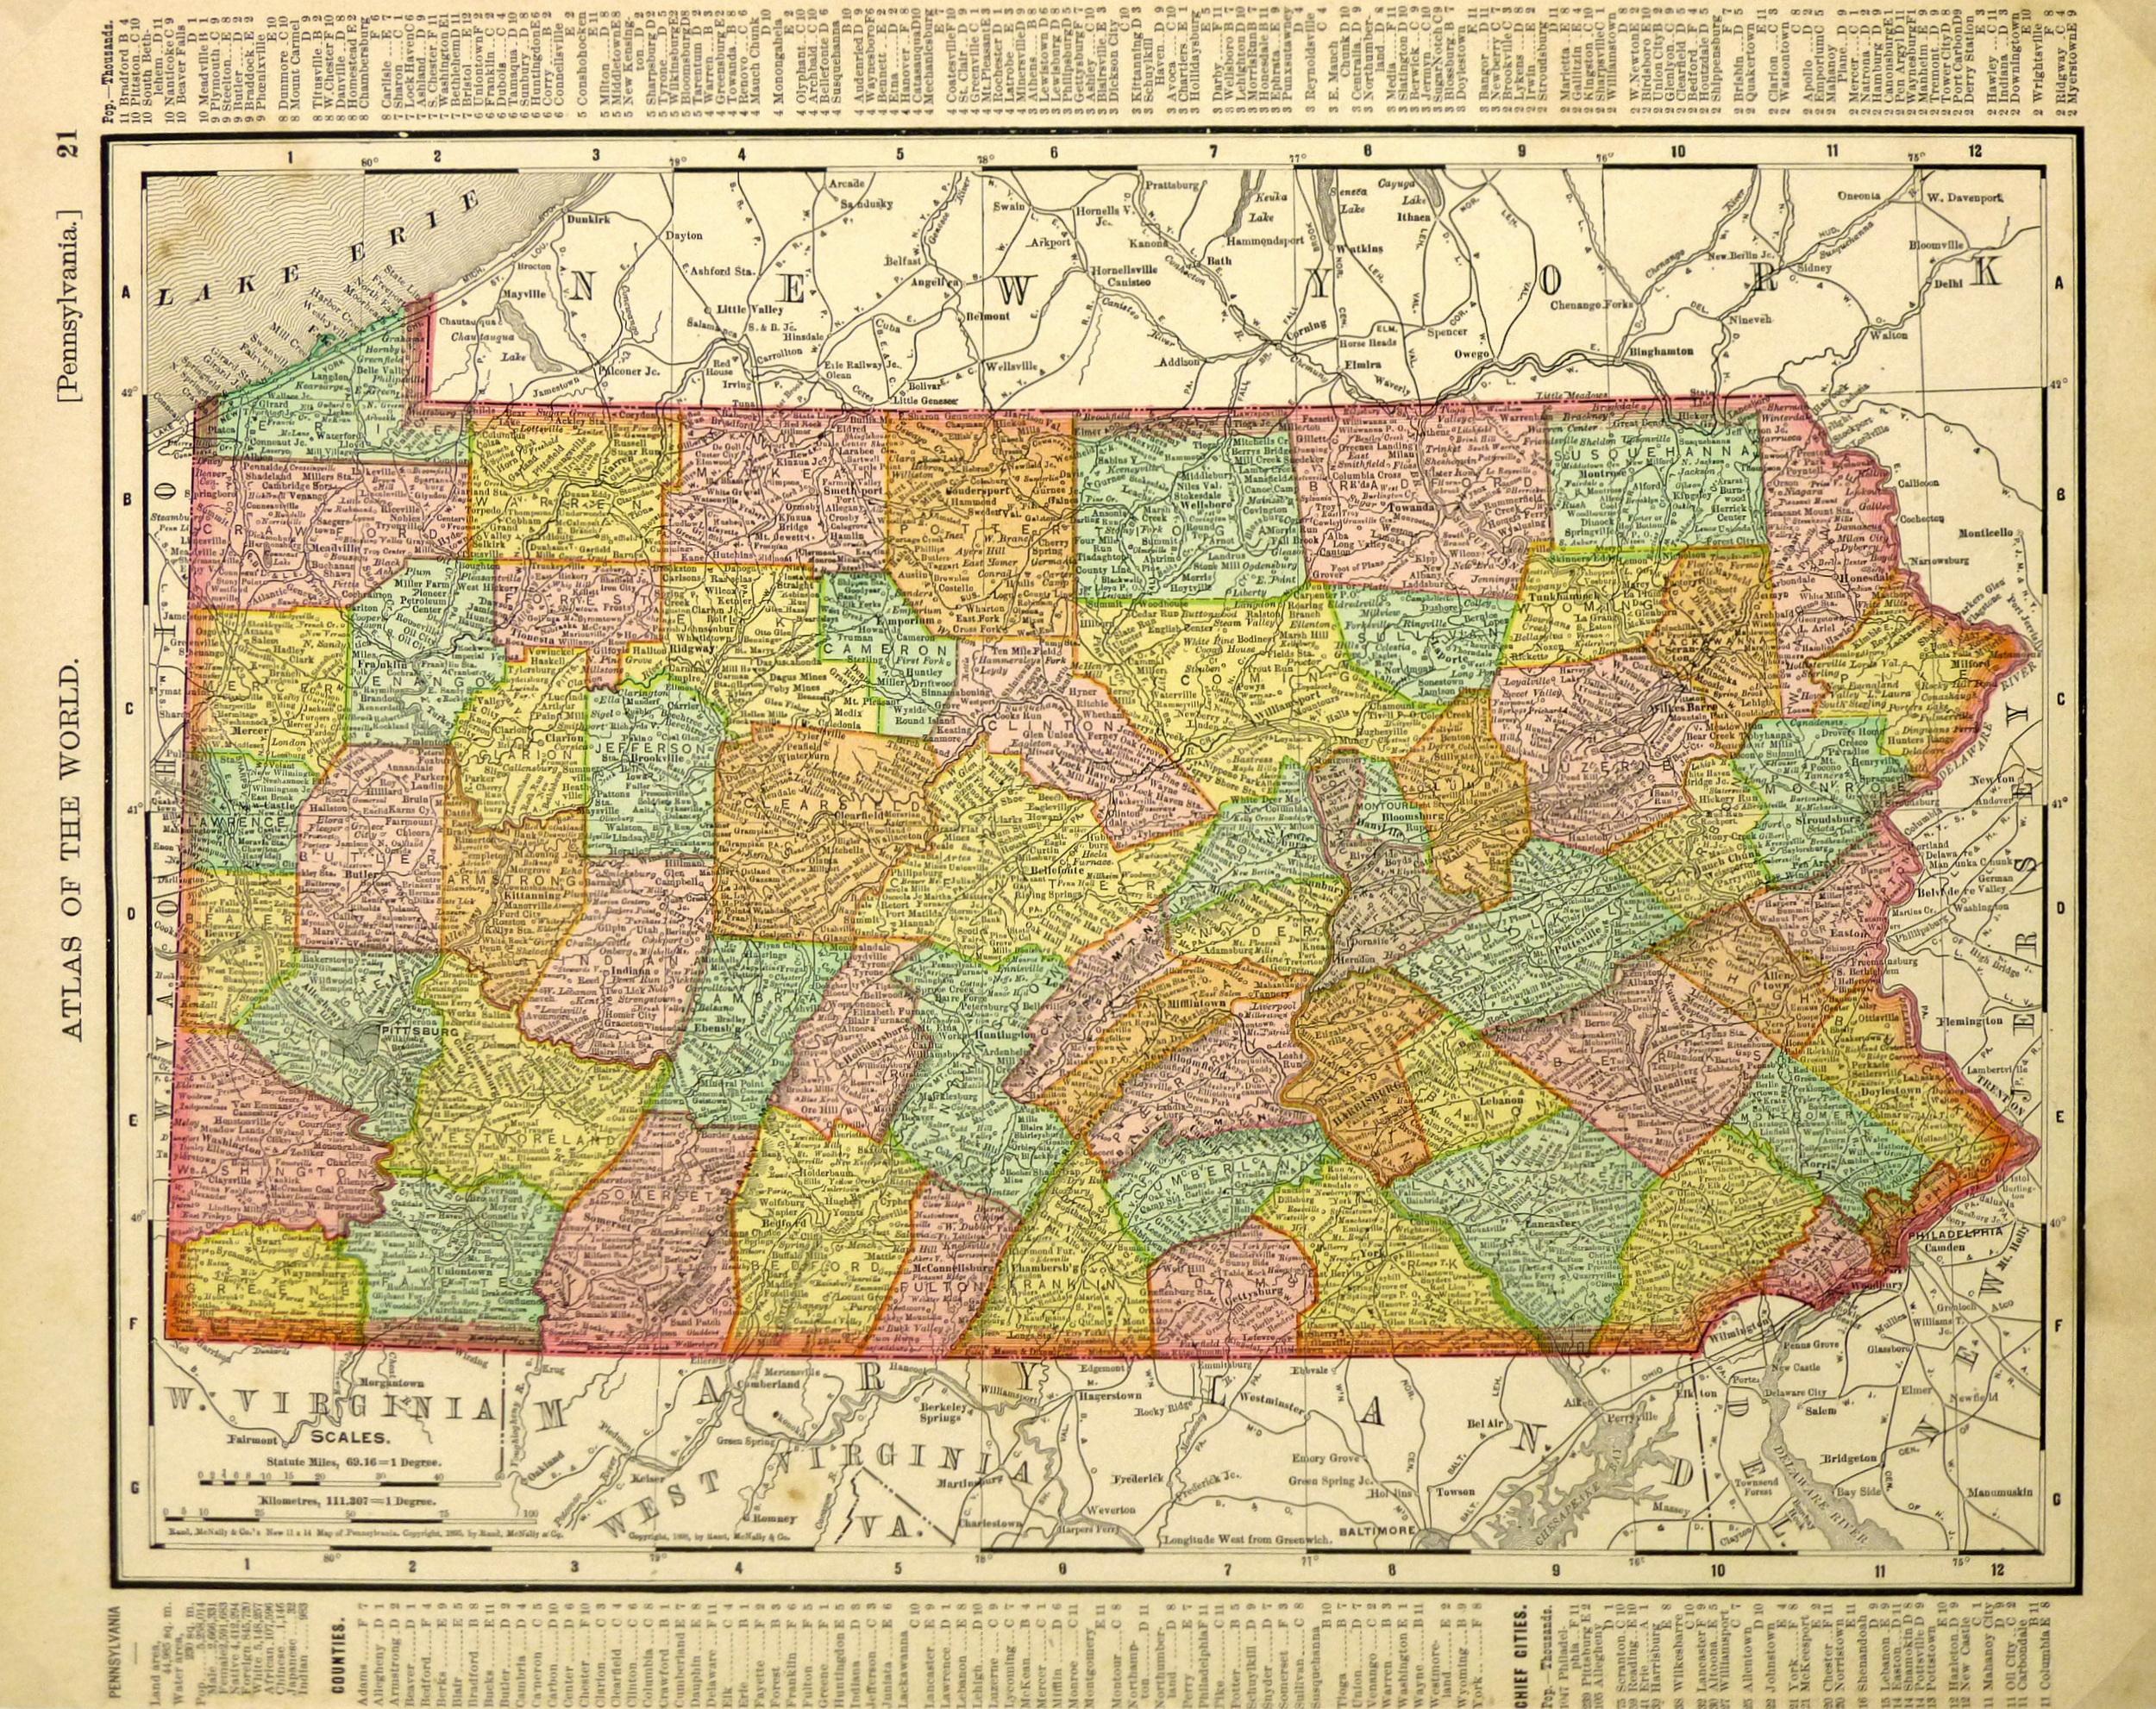 Map of Pennsylvania, 1895-main-6449K